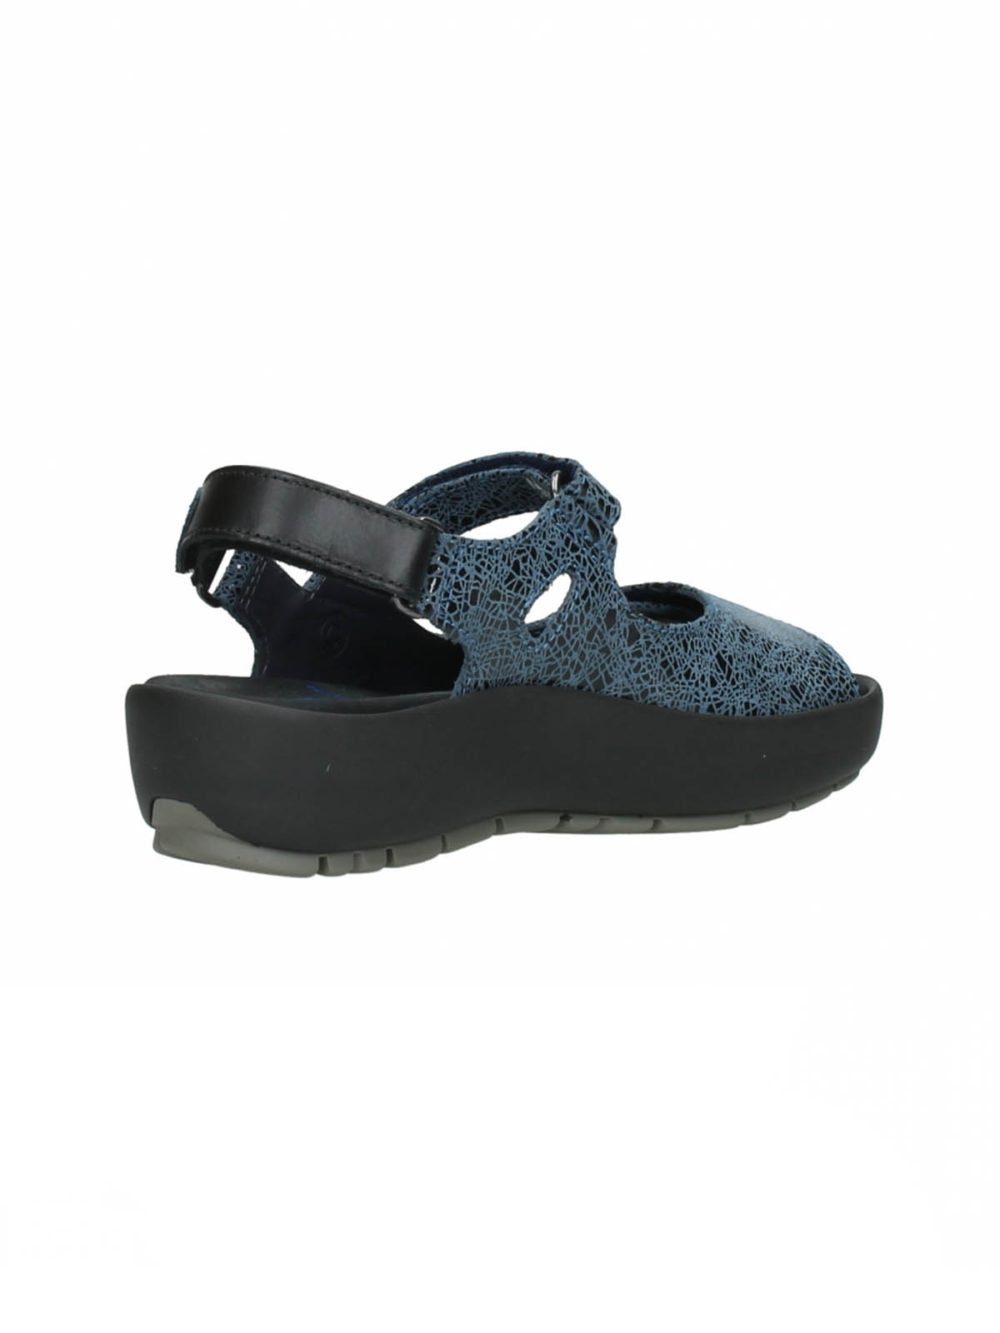 Rio Sandal Wolky Shoes Katie Kerr Women's Shoes